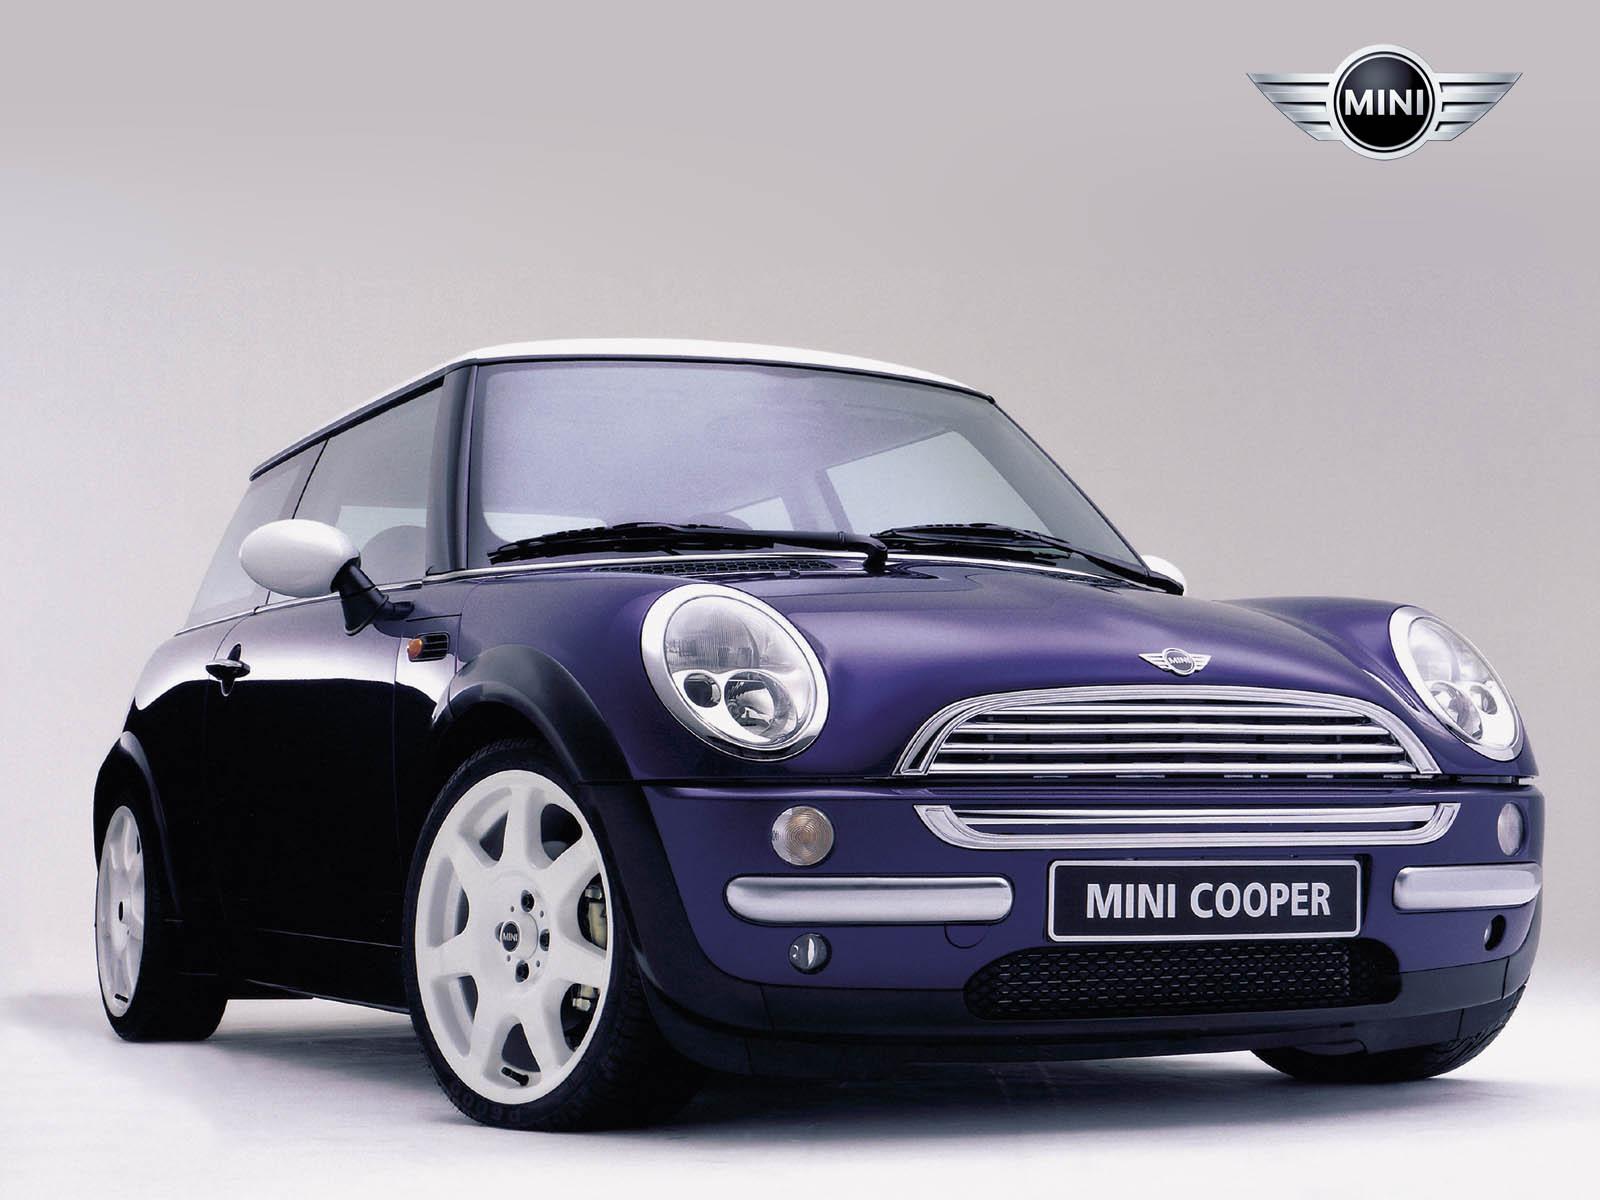 BMW Mini Cooper Images Wallpaper For Ipad